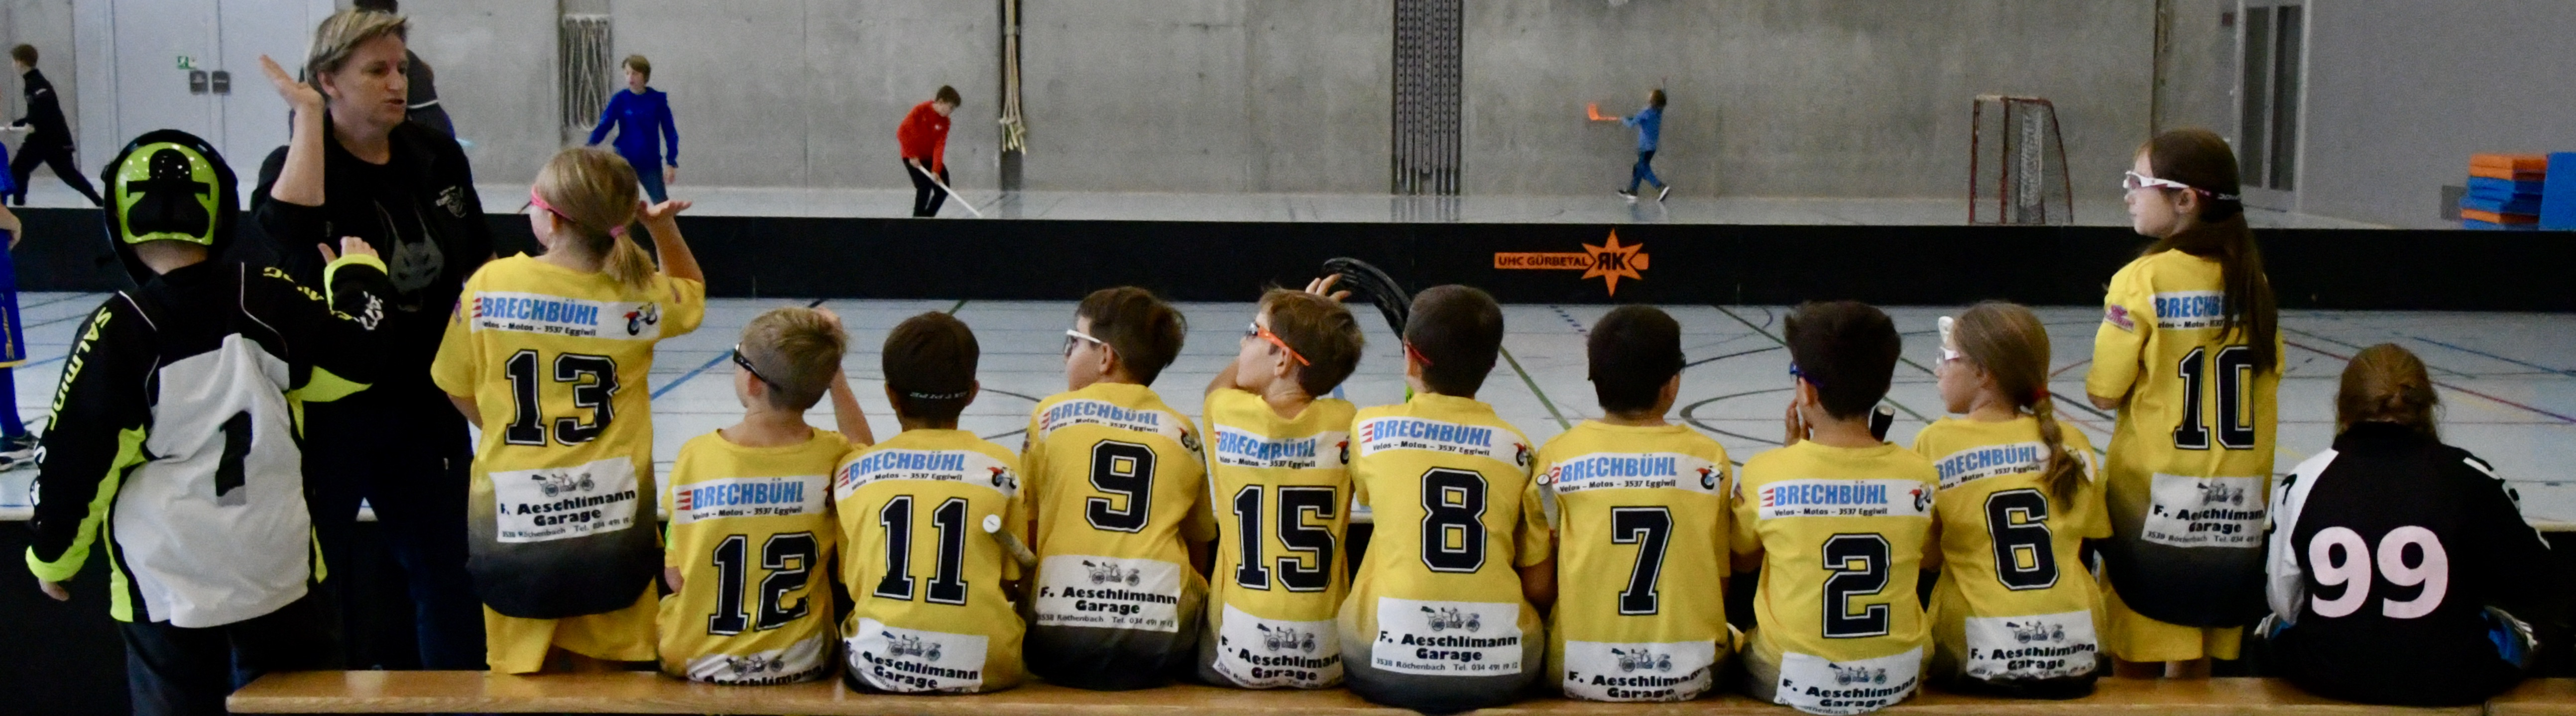 Junioren D Eggiwil - Lions Konolfingen, Saison 2019/20